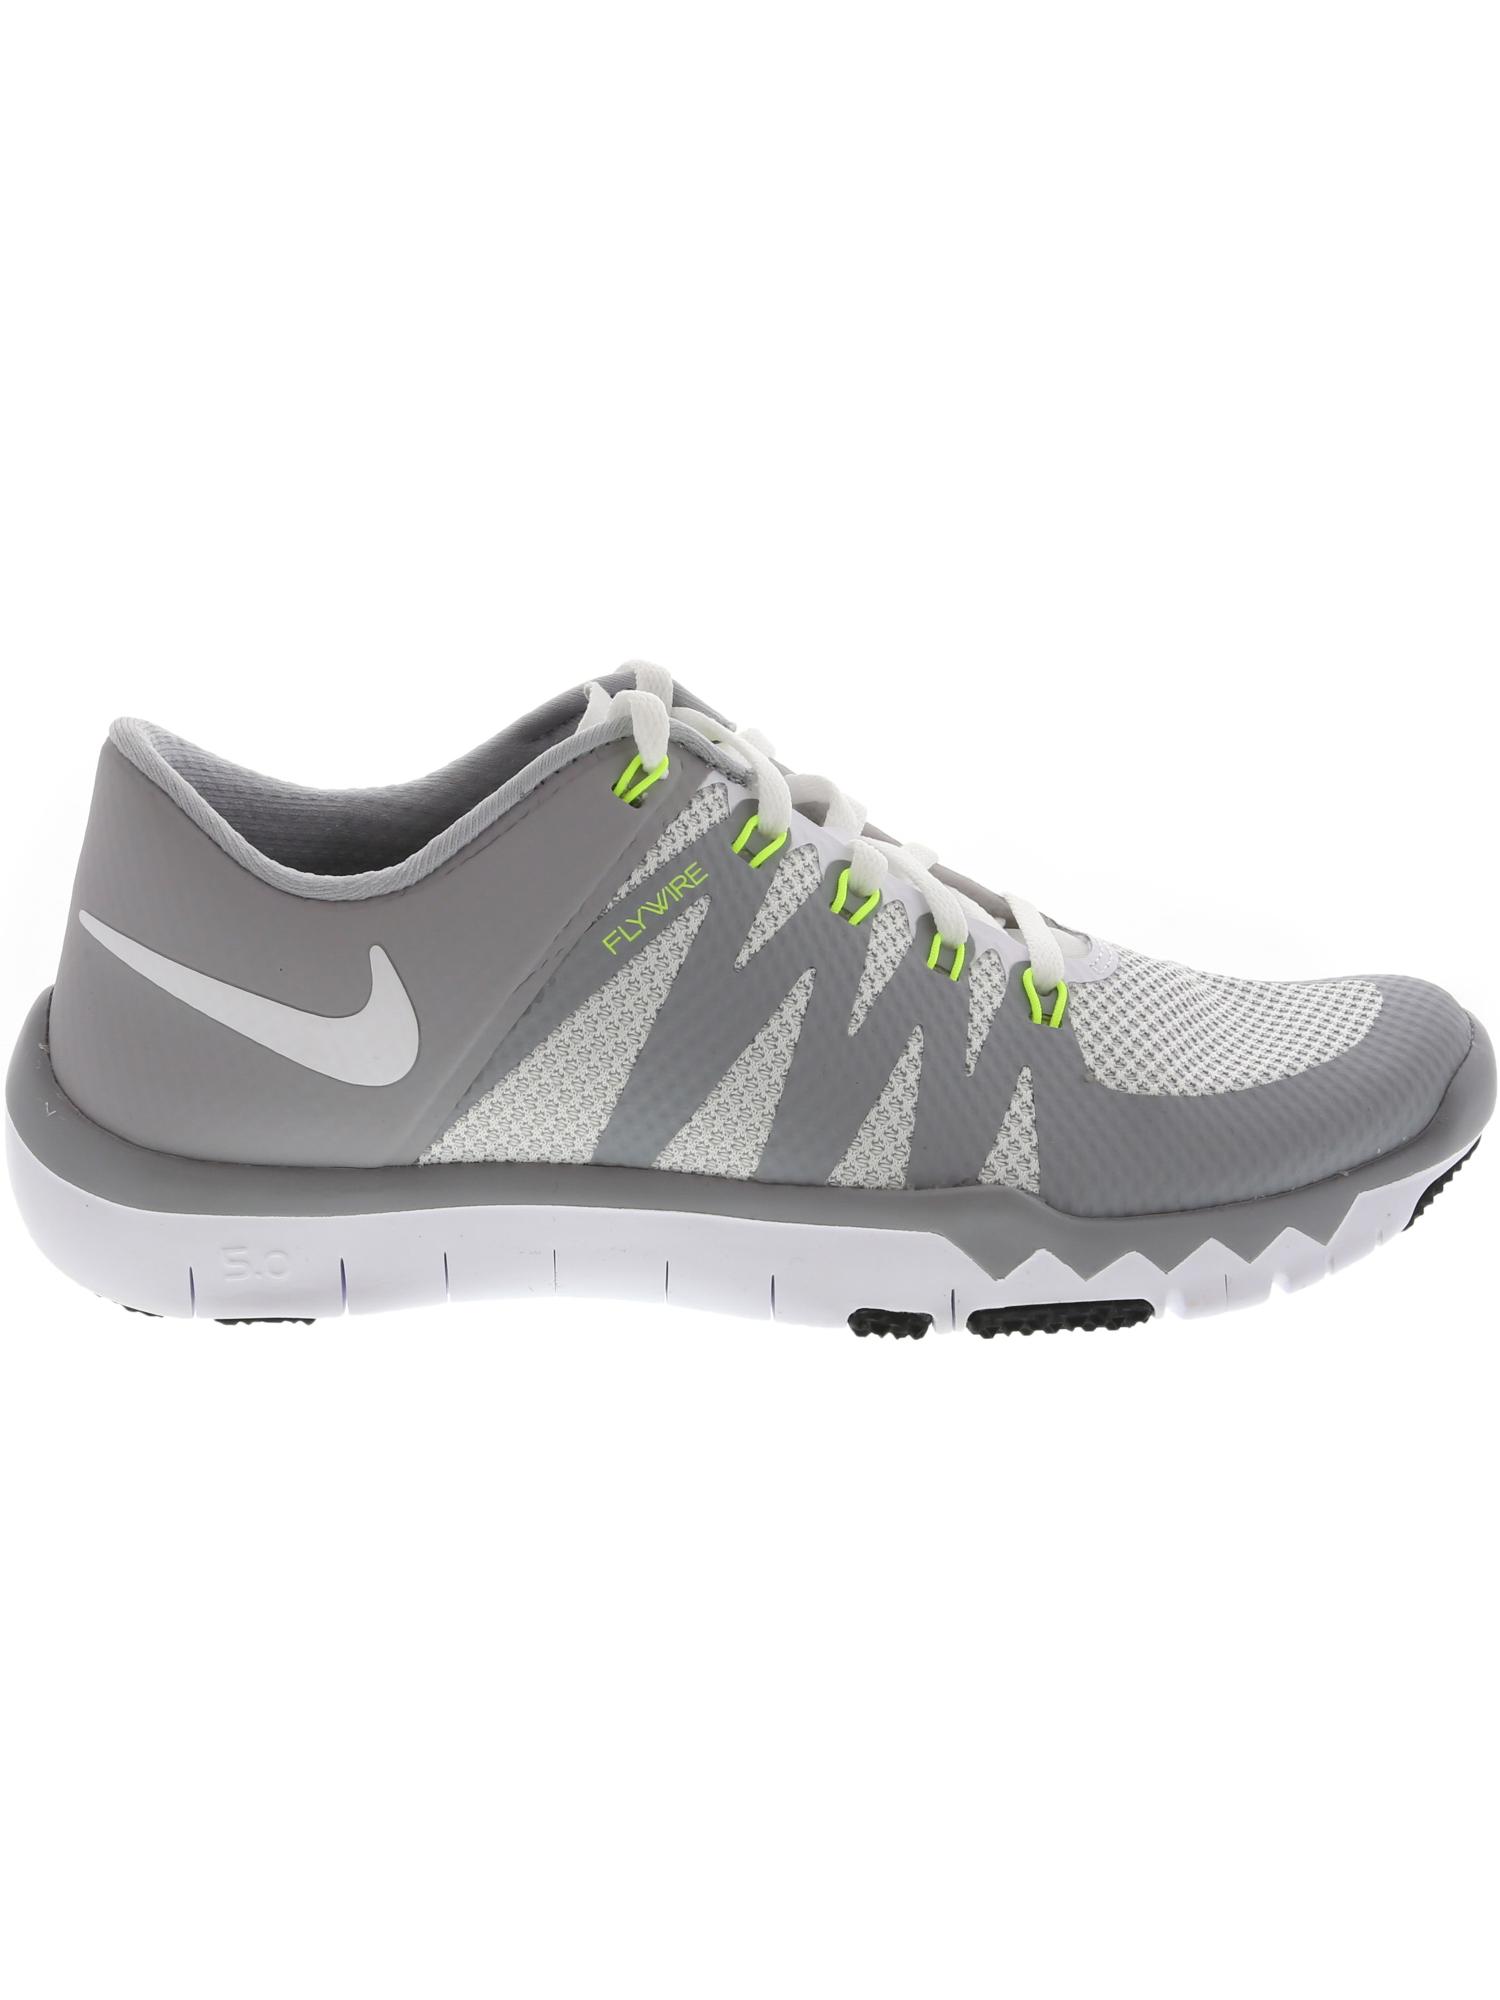 low priced 8b6f8 07d04 Nike-Men-039-s-Free-Trainer-5-0-